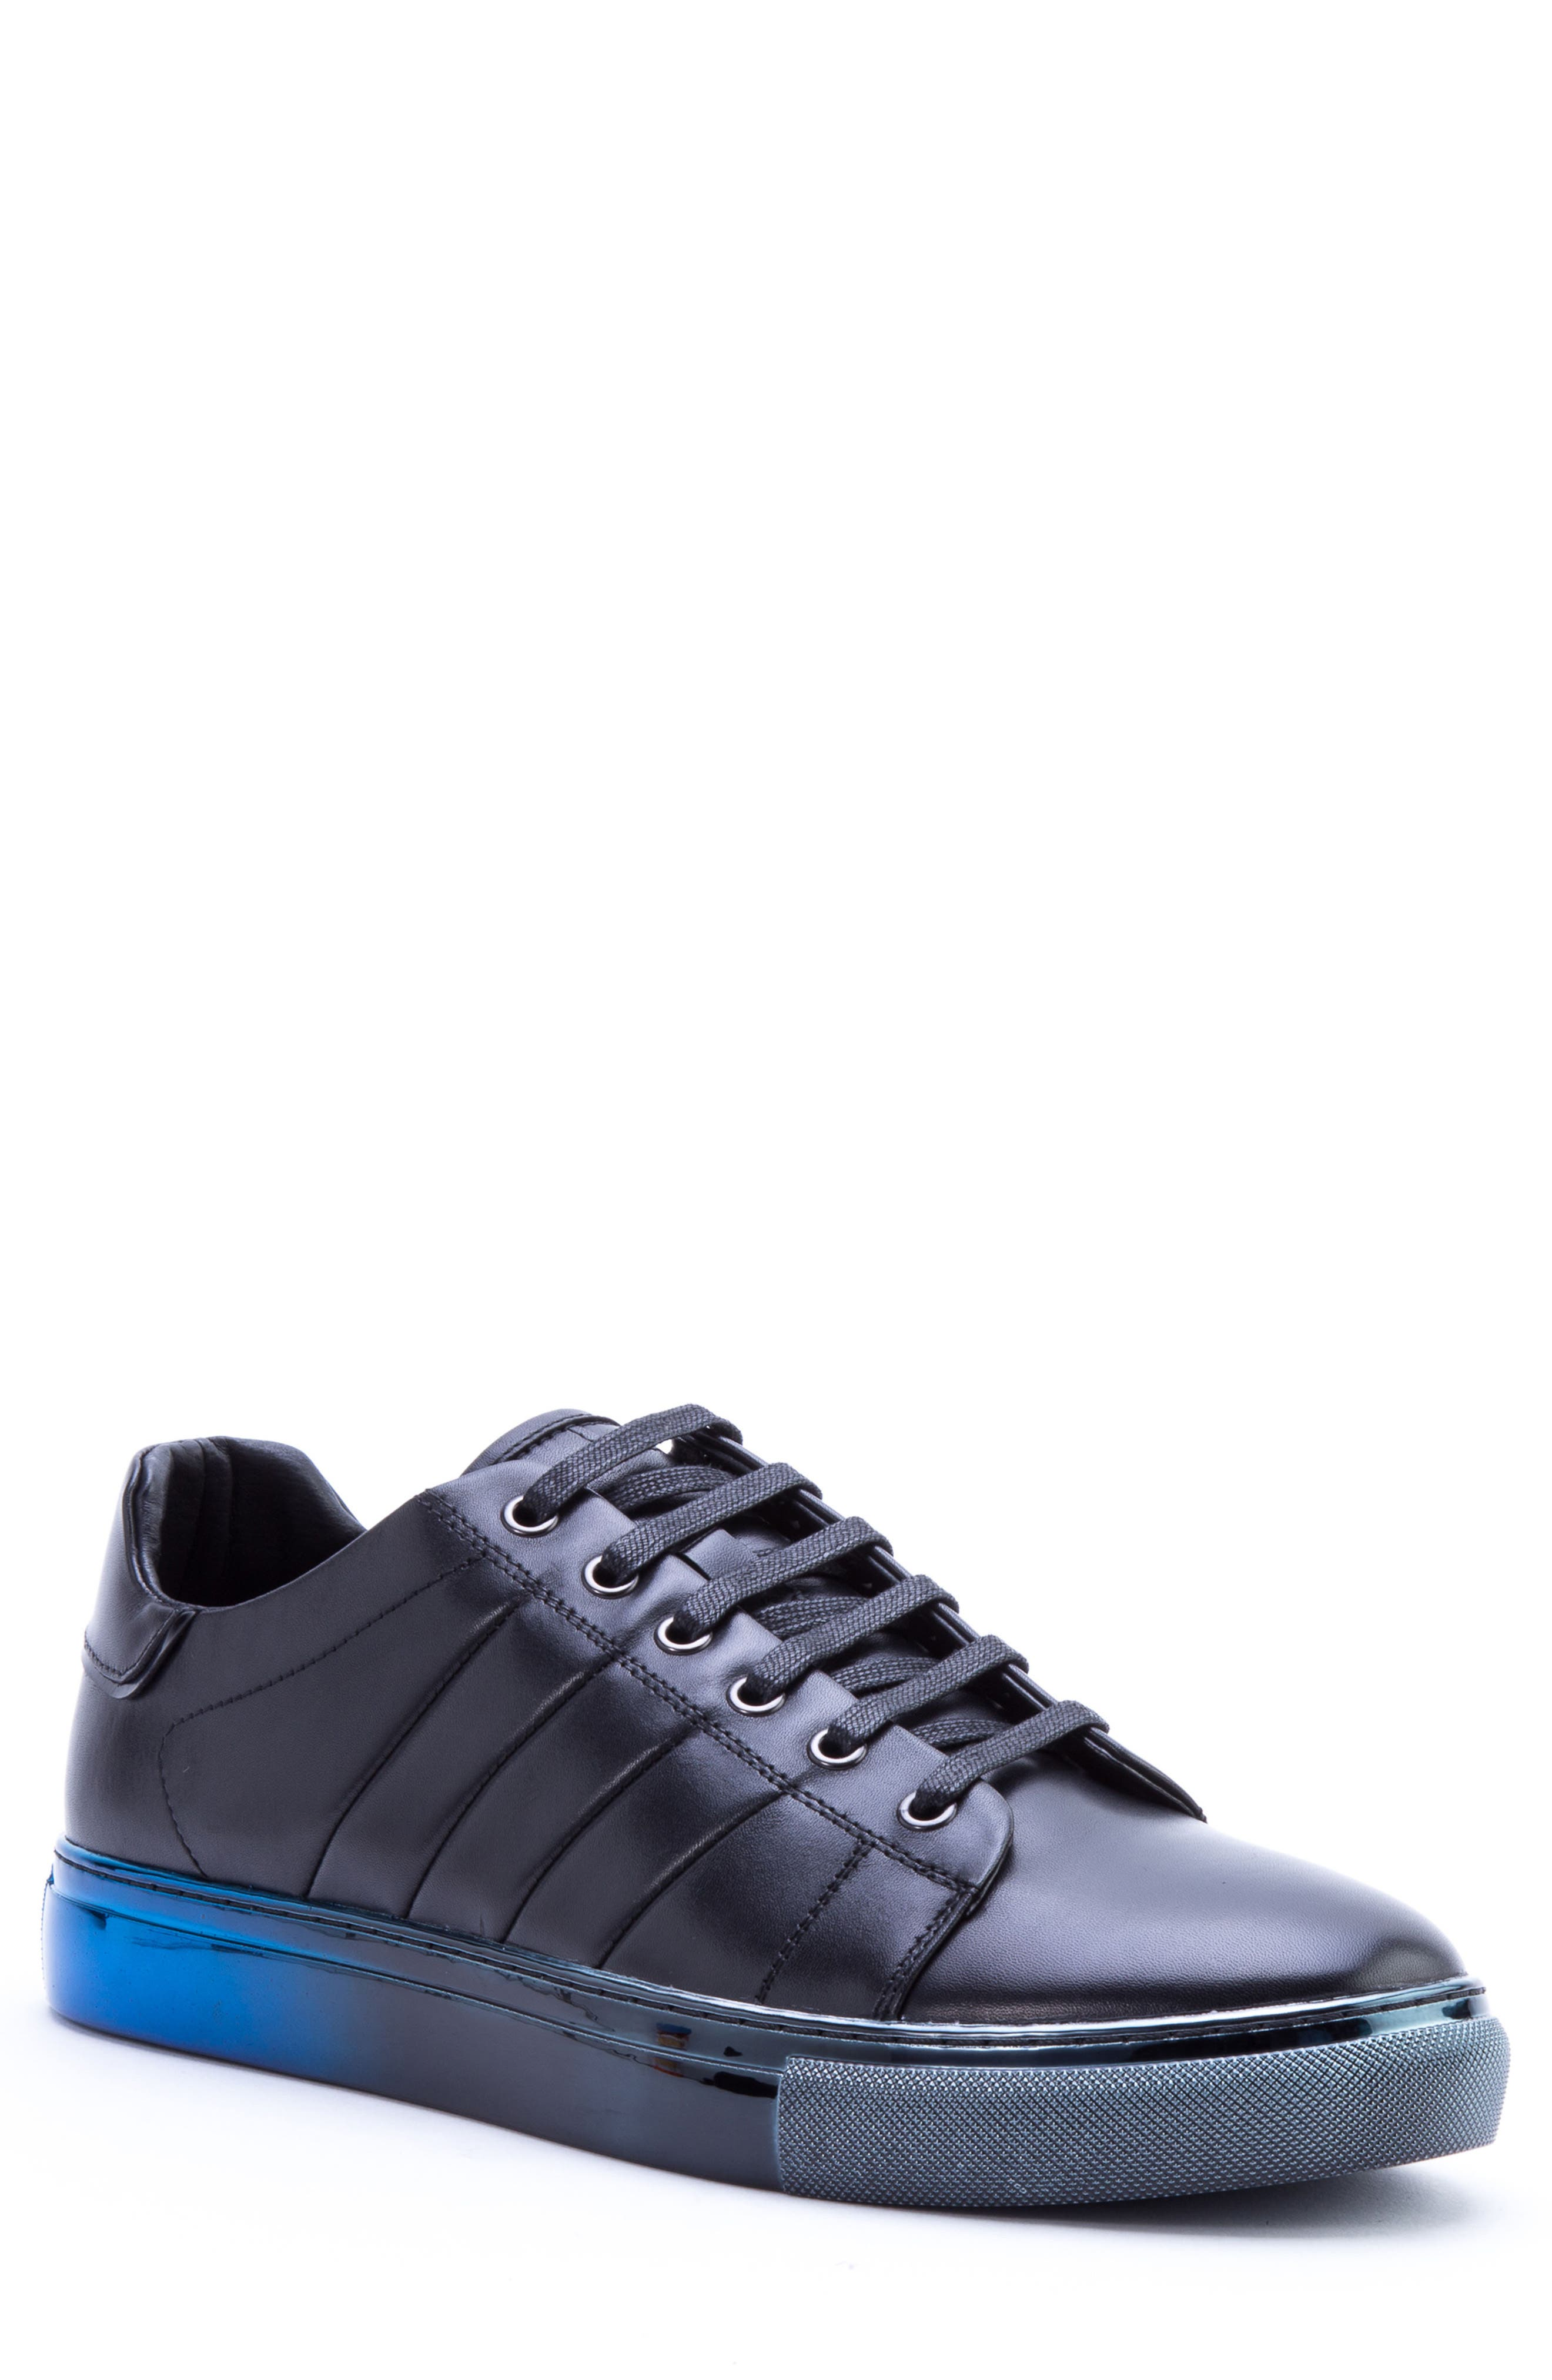 Brando Sneaker,                         Main,                         color, BLACK LEATHER